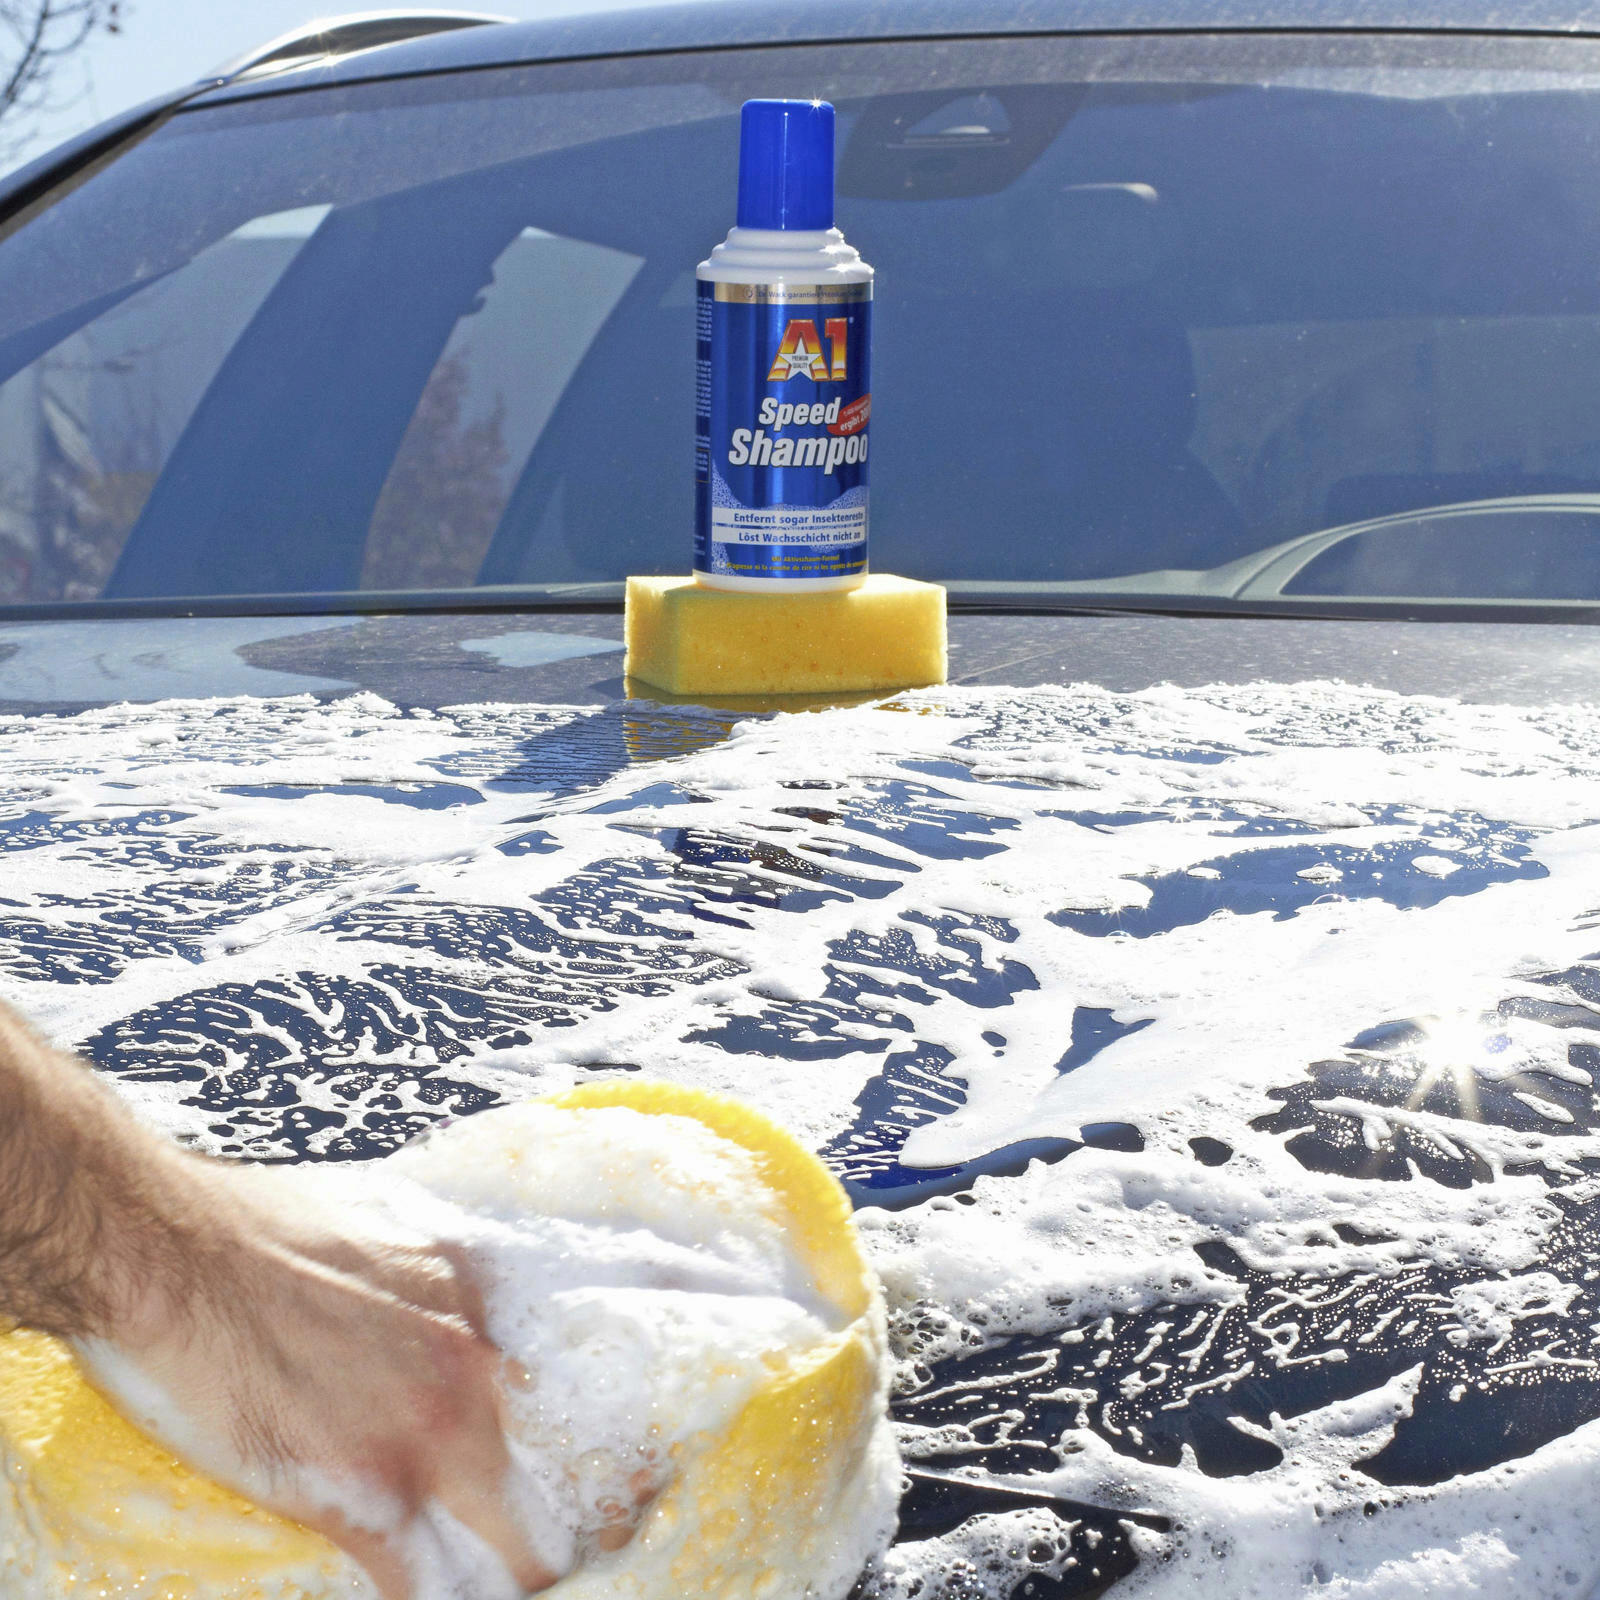 2x Dr. Wack A1 Speed Shampoo 500 ML sehr ergiebig, gruendlich, Aktivschaum-Formel